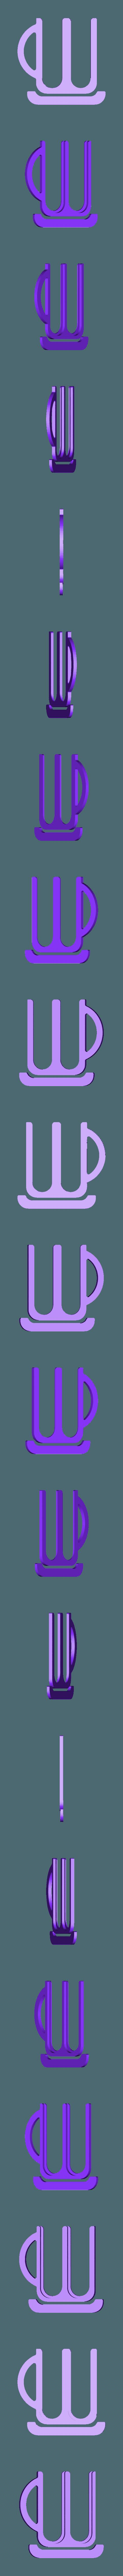 Nespresso Capsule Holder.stl Download free STL file Nespresso Capsule Holder • Design to 3D print, phobosmoon